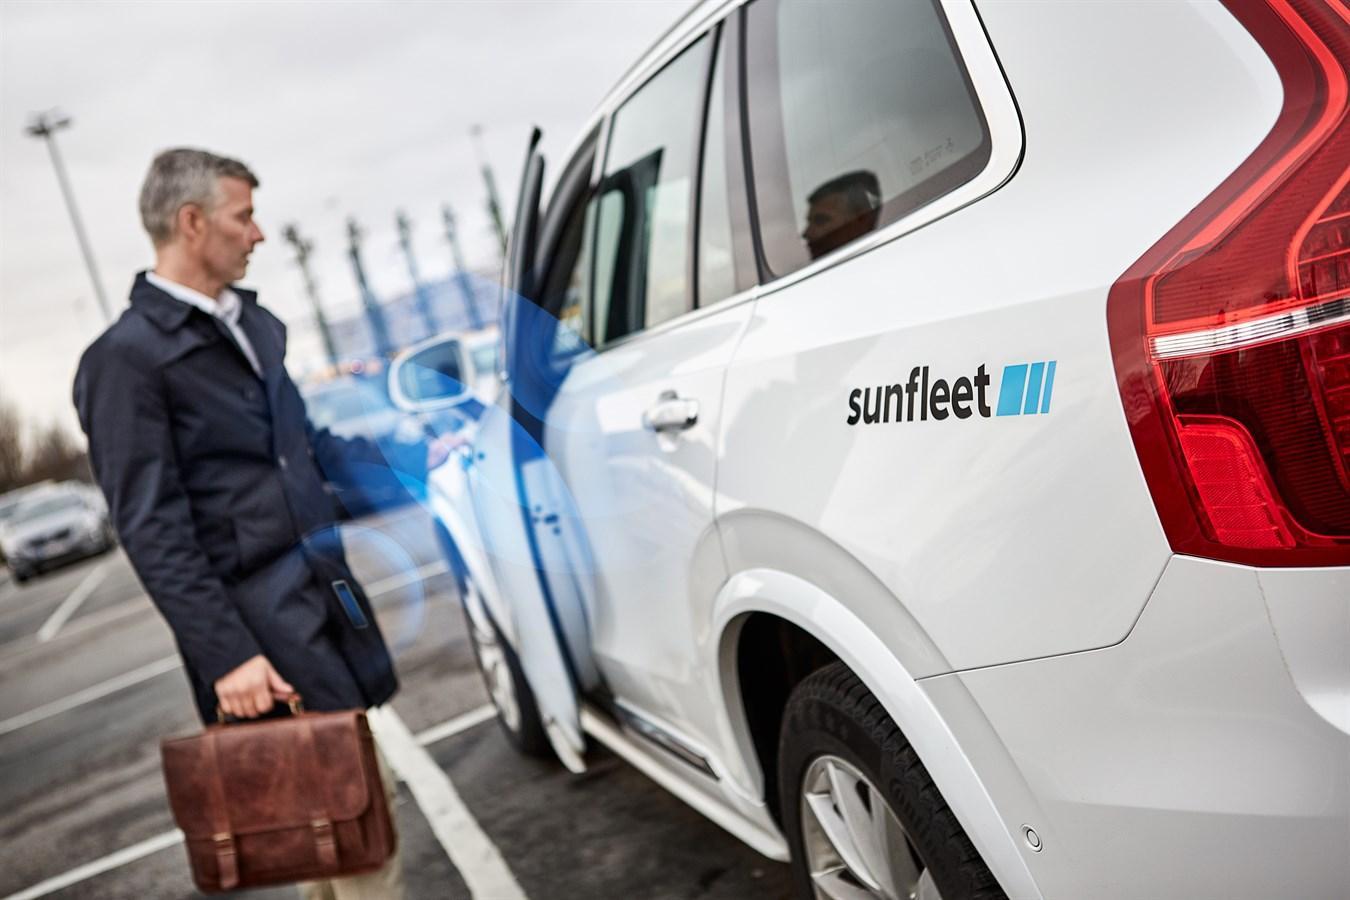 Volvo Cars Tests Replacing Keys with Smart Phone App - Volvo Car USA Newsroom